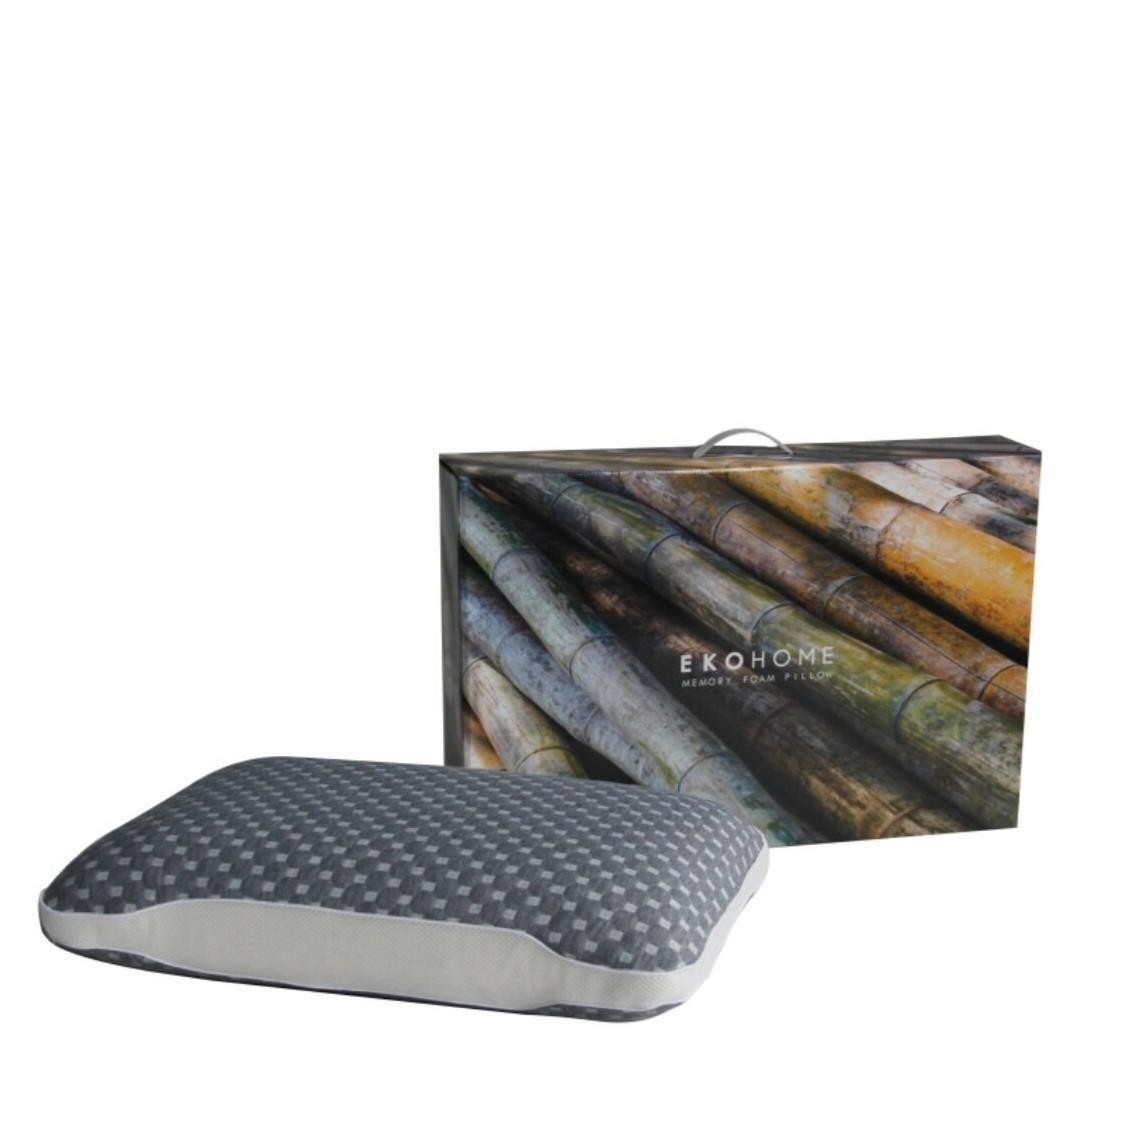 Ekohome Bamboo Charcoal Memory Foam Pillow